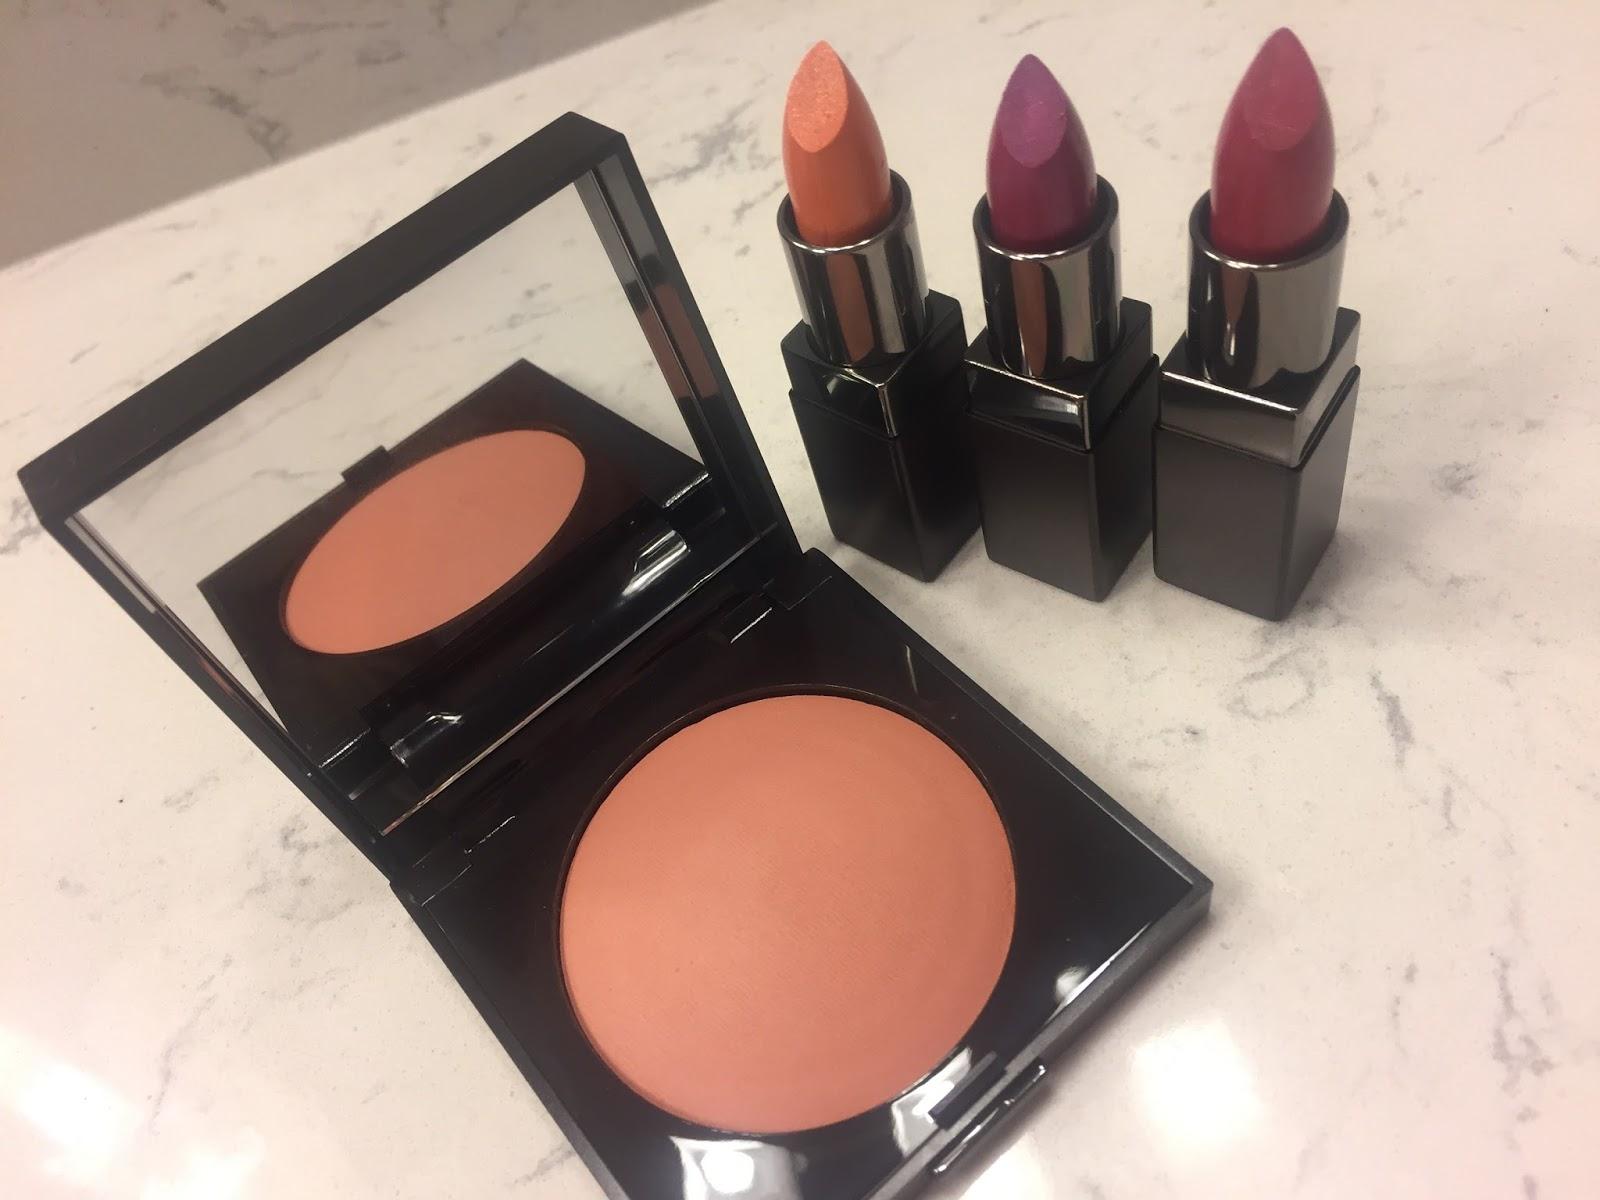 Mercier laura colour story spring makeup collection foto